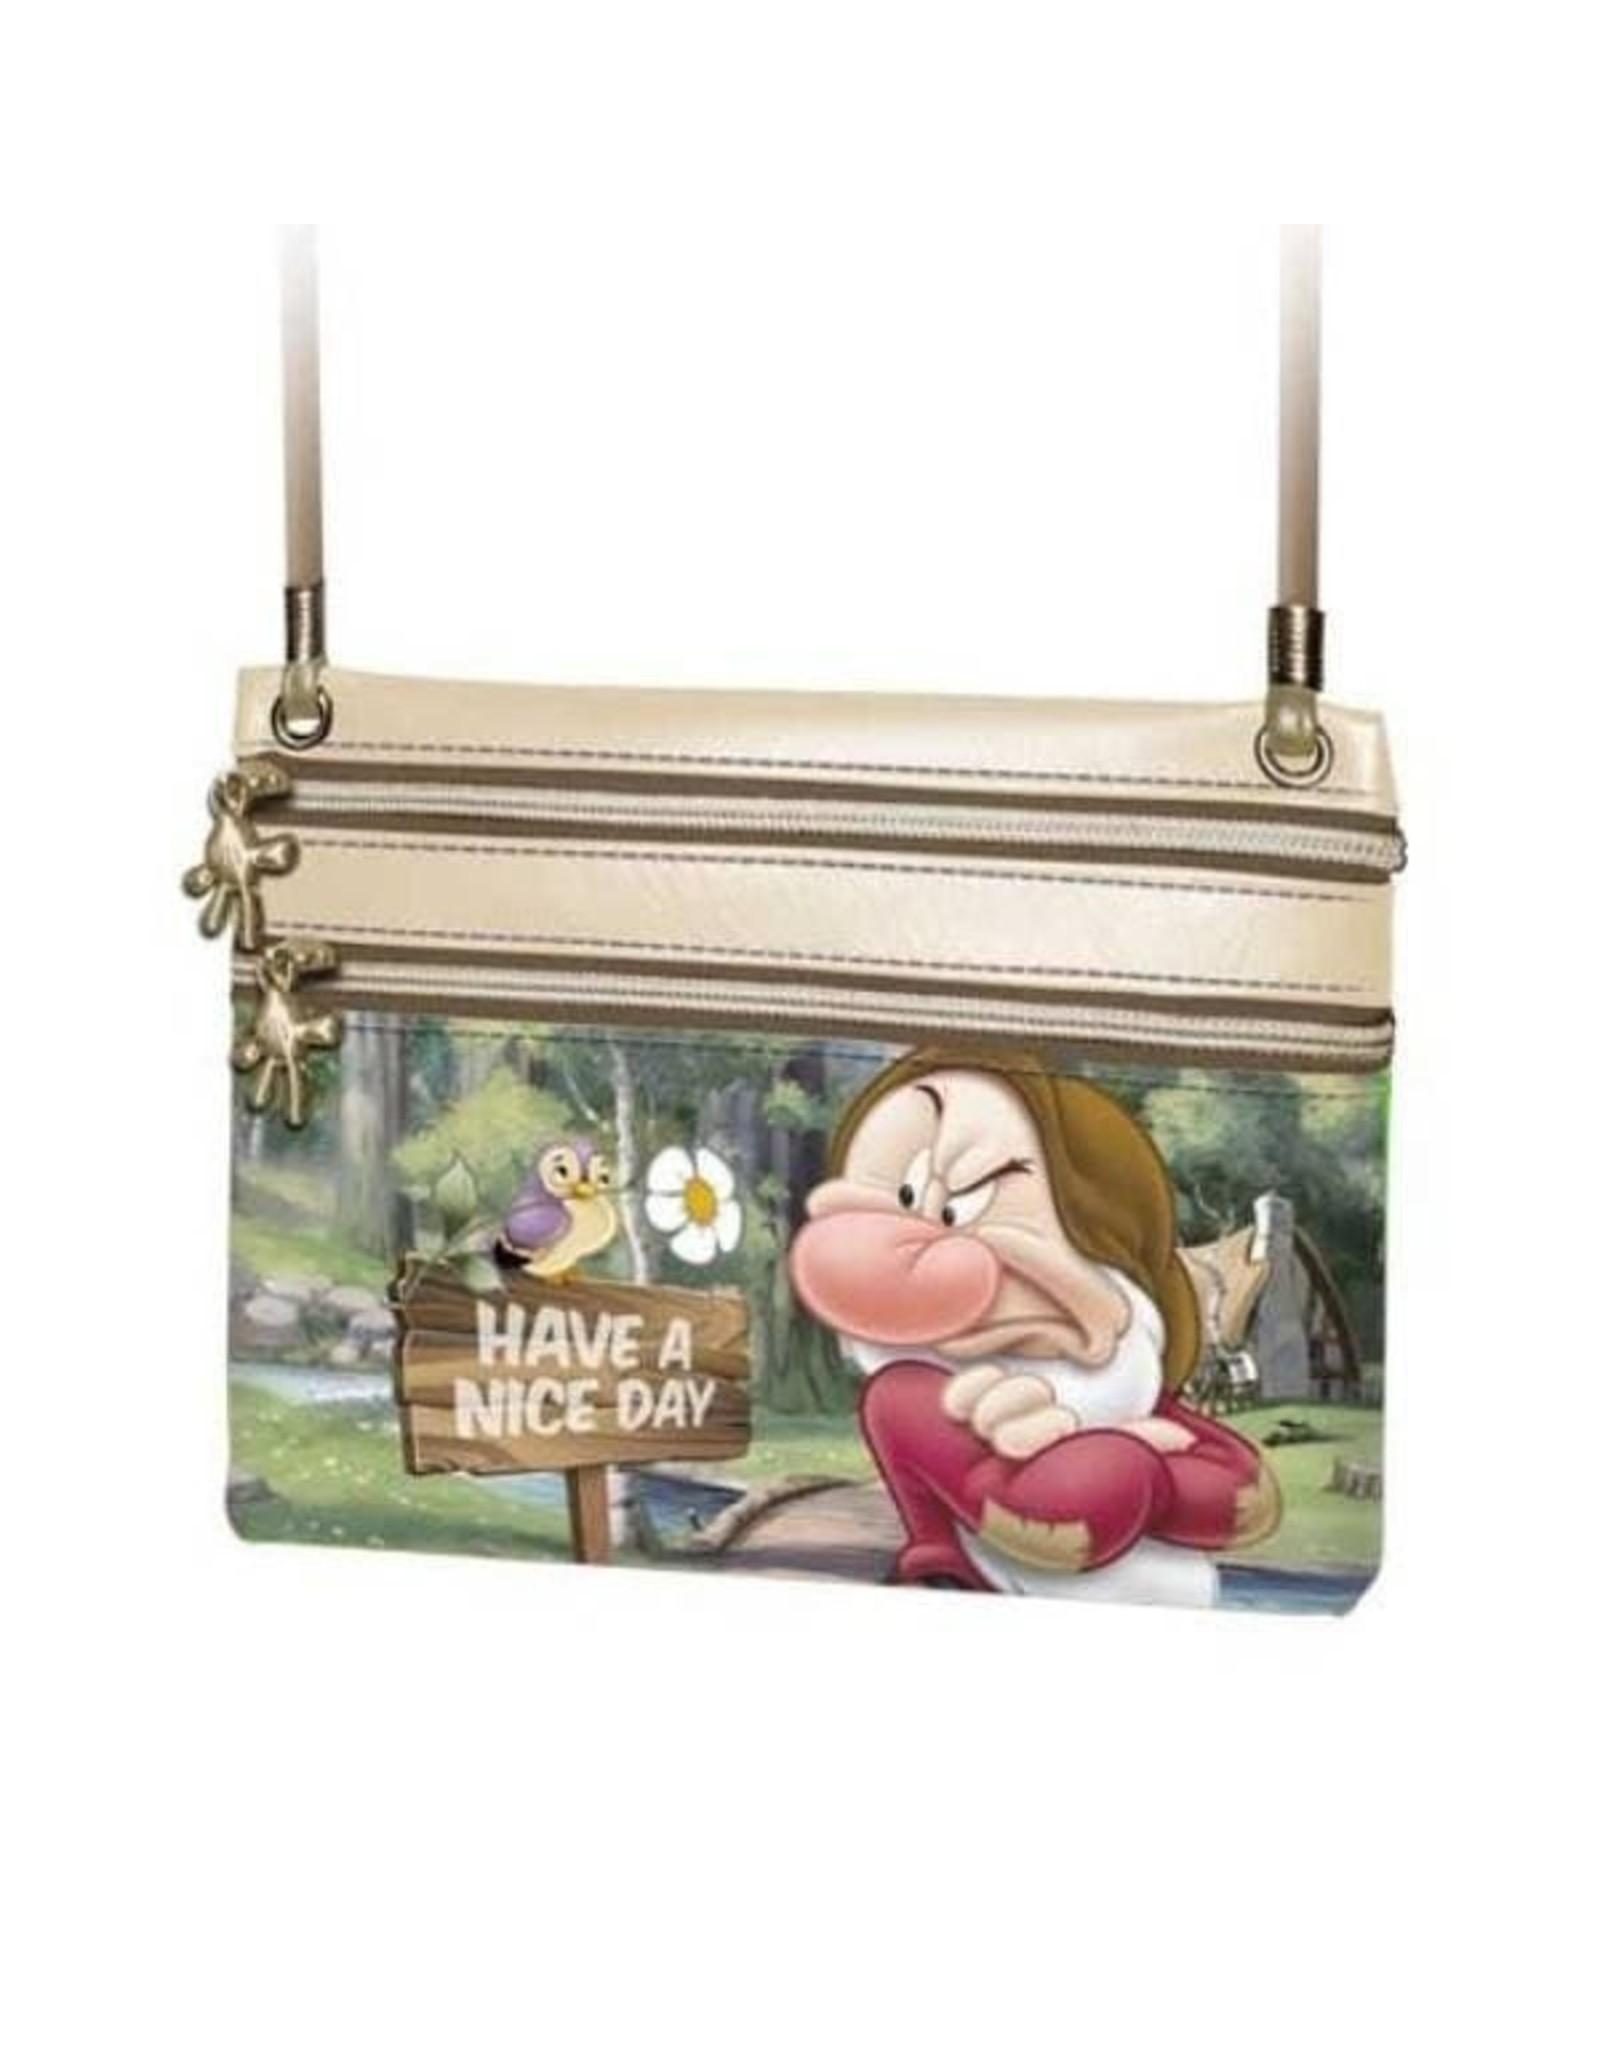 Disney Disney bags - Disney little shoulder bag Grumpy Have a nice day